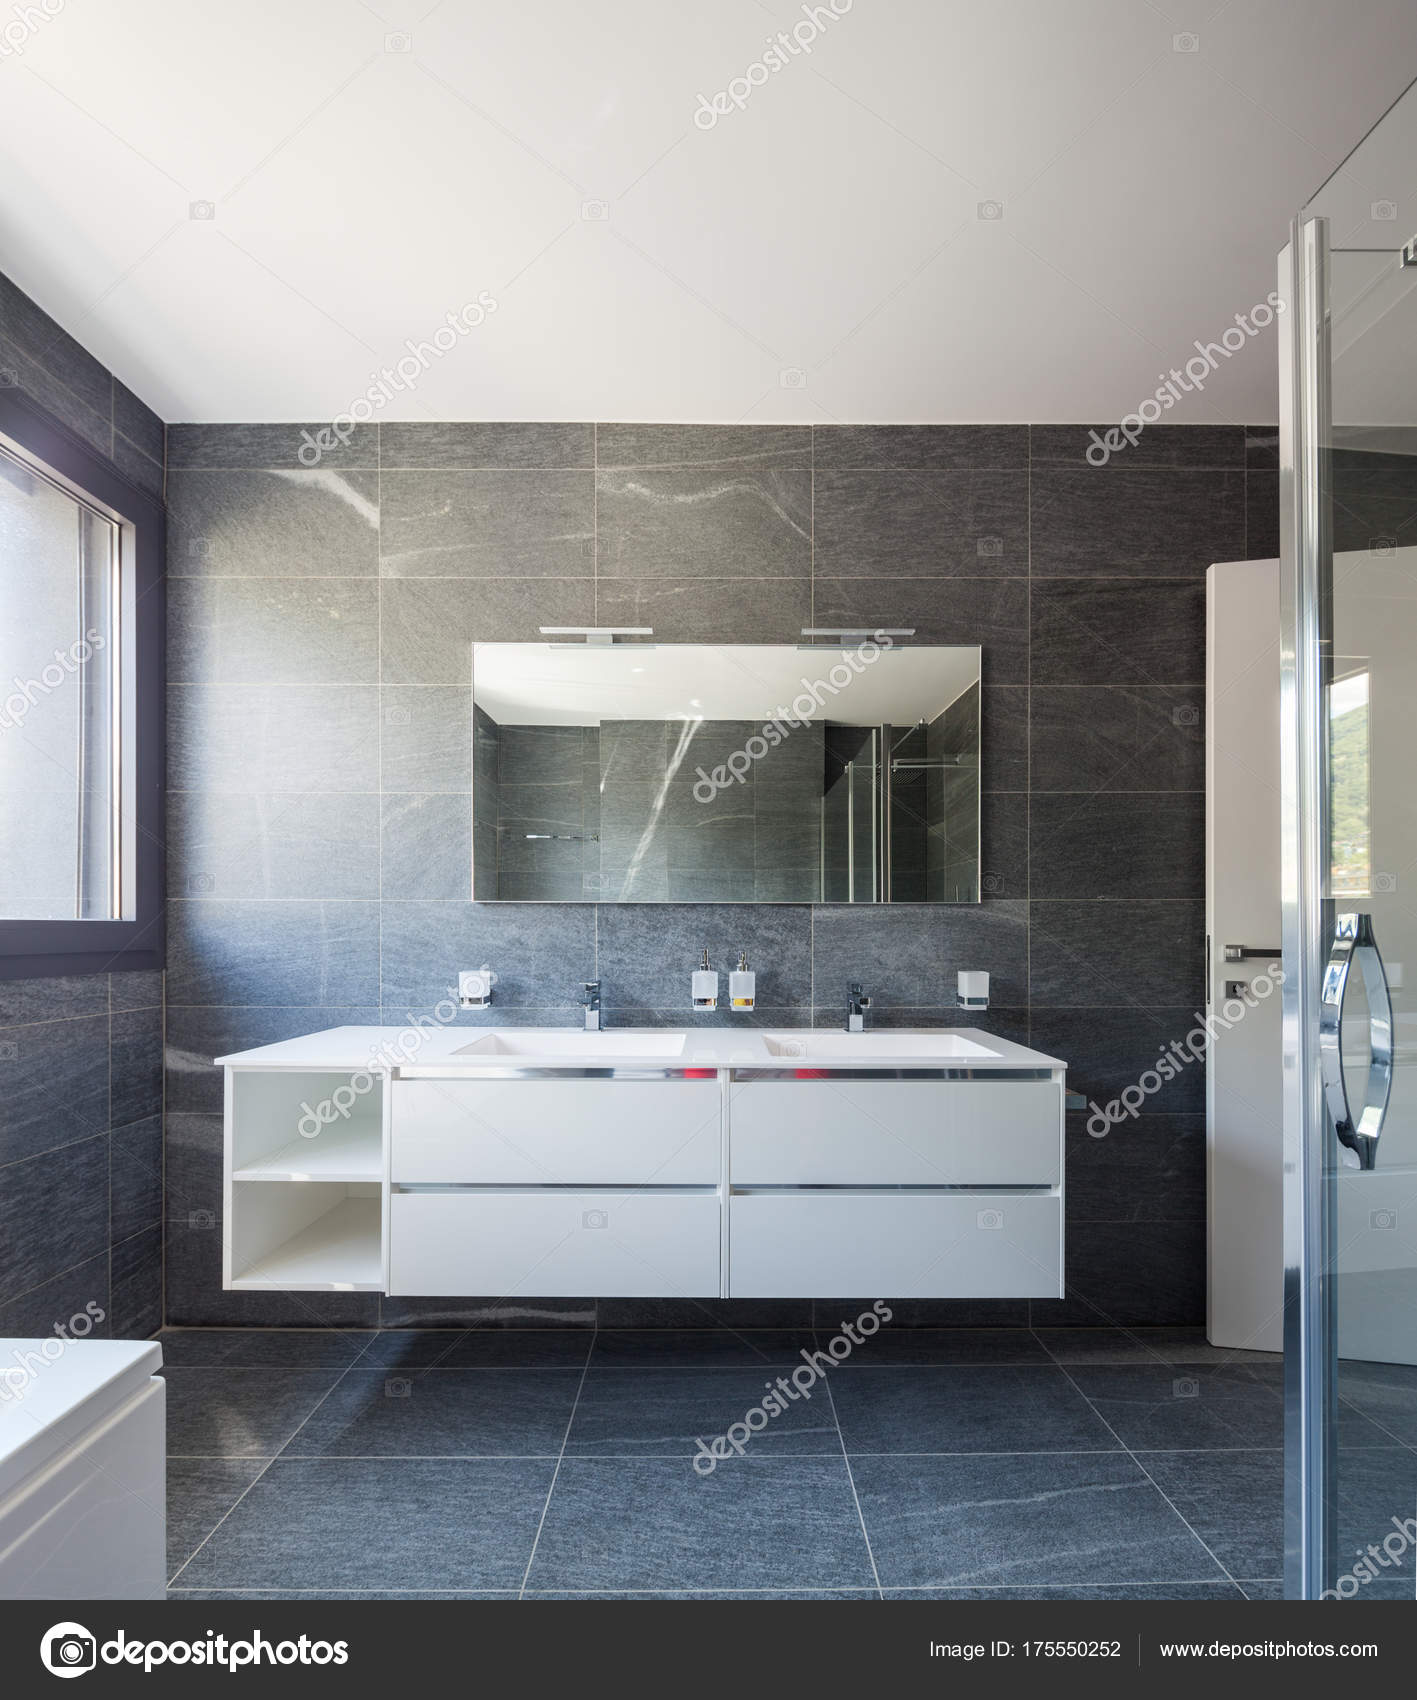 Frontal van moderne badkamer — Stockfoto © Zveiger #175550252